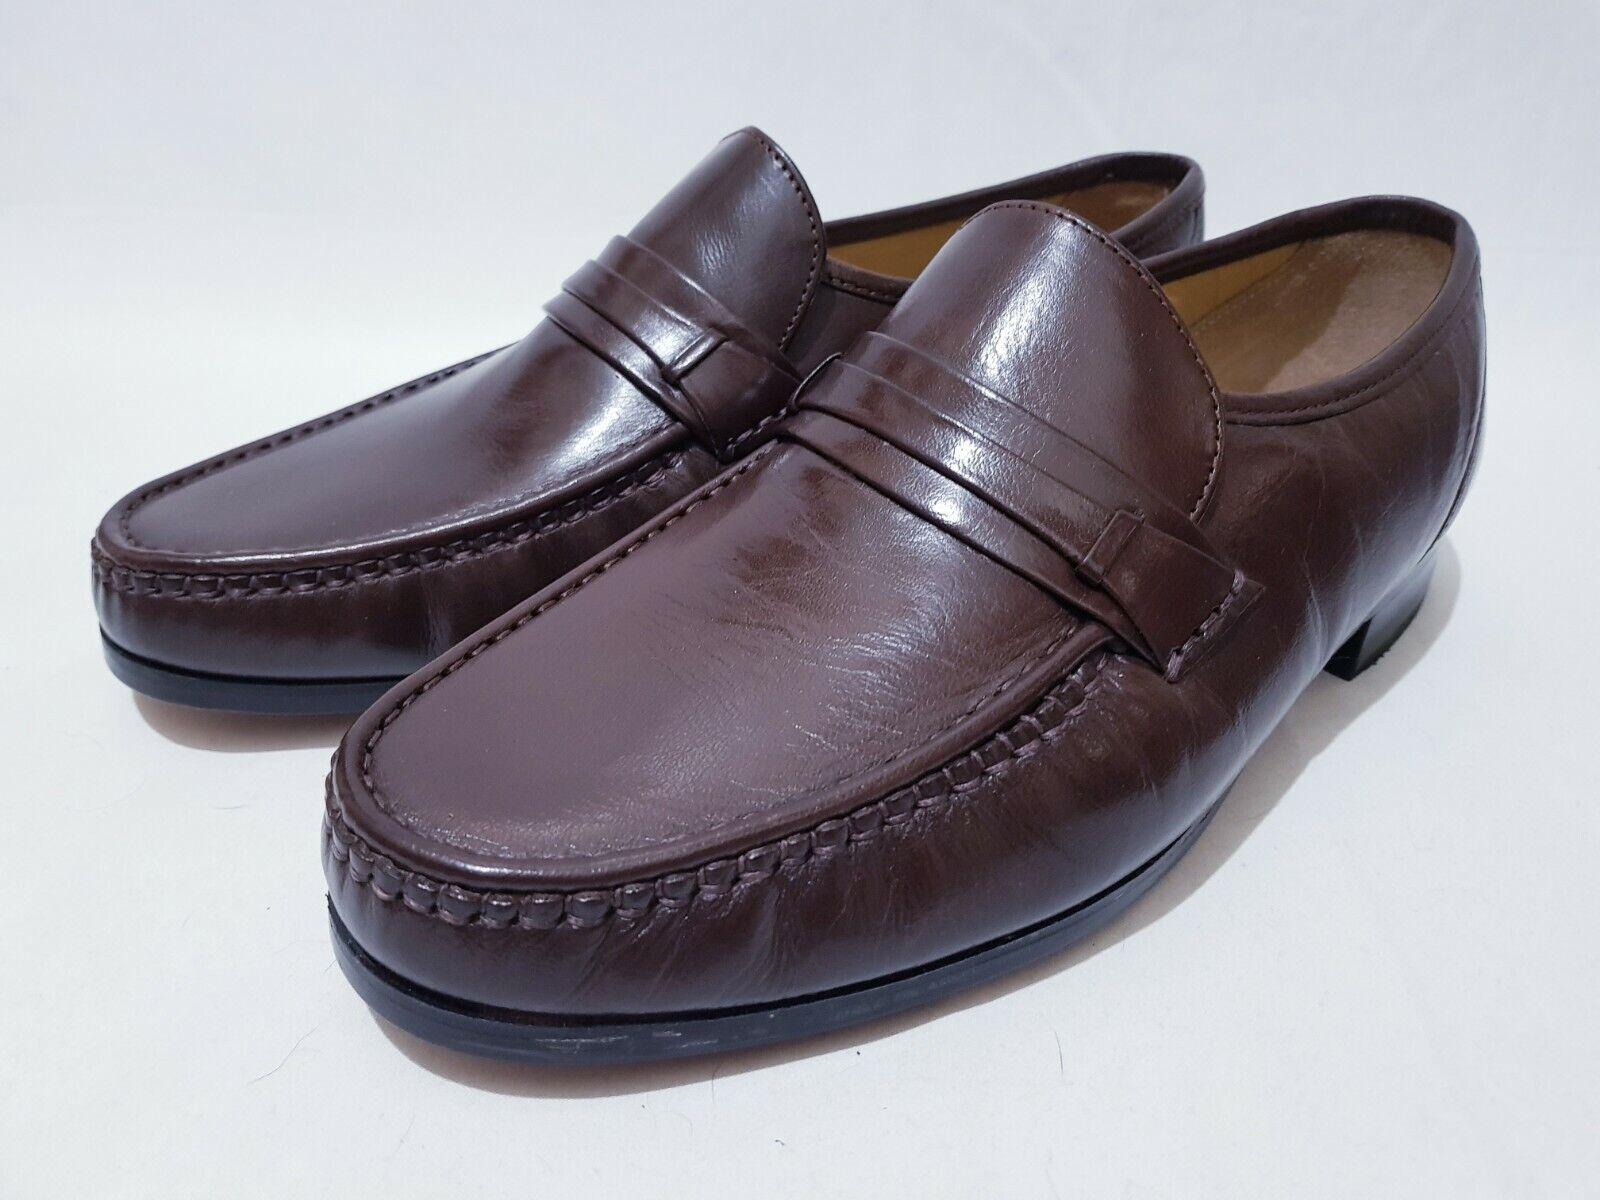 Mens Clarks Shoes Slip on Loafer Padded Comfort Premium Leather UK 9, EUR 43